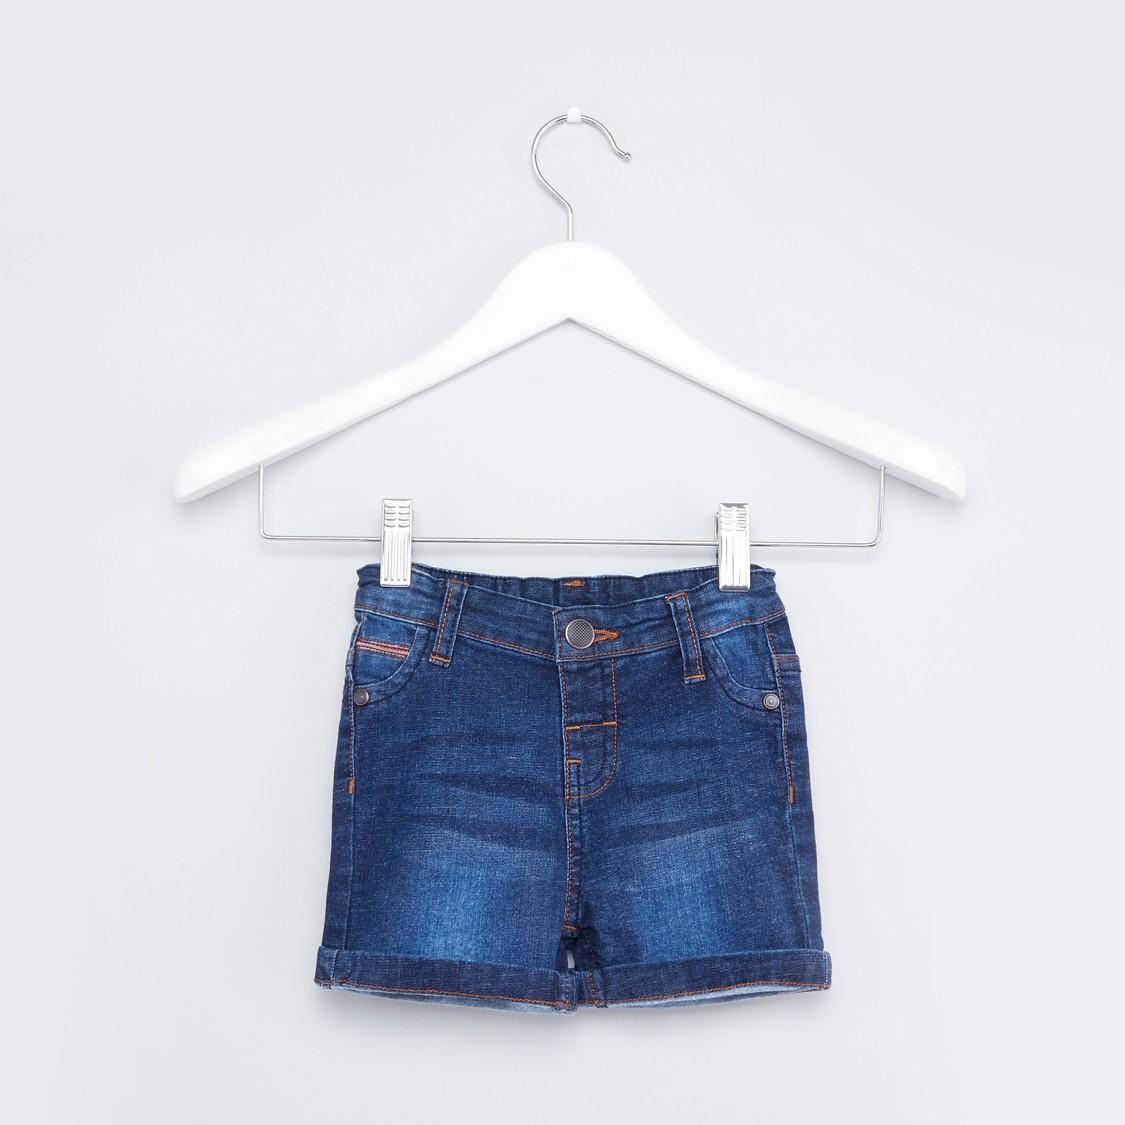 Denim Shorts with Pocket Detail